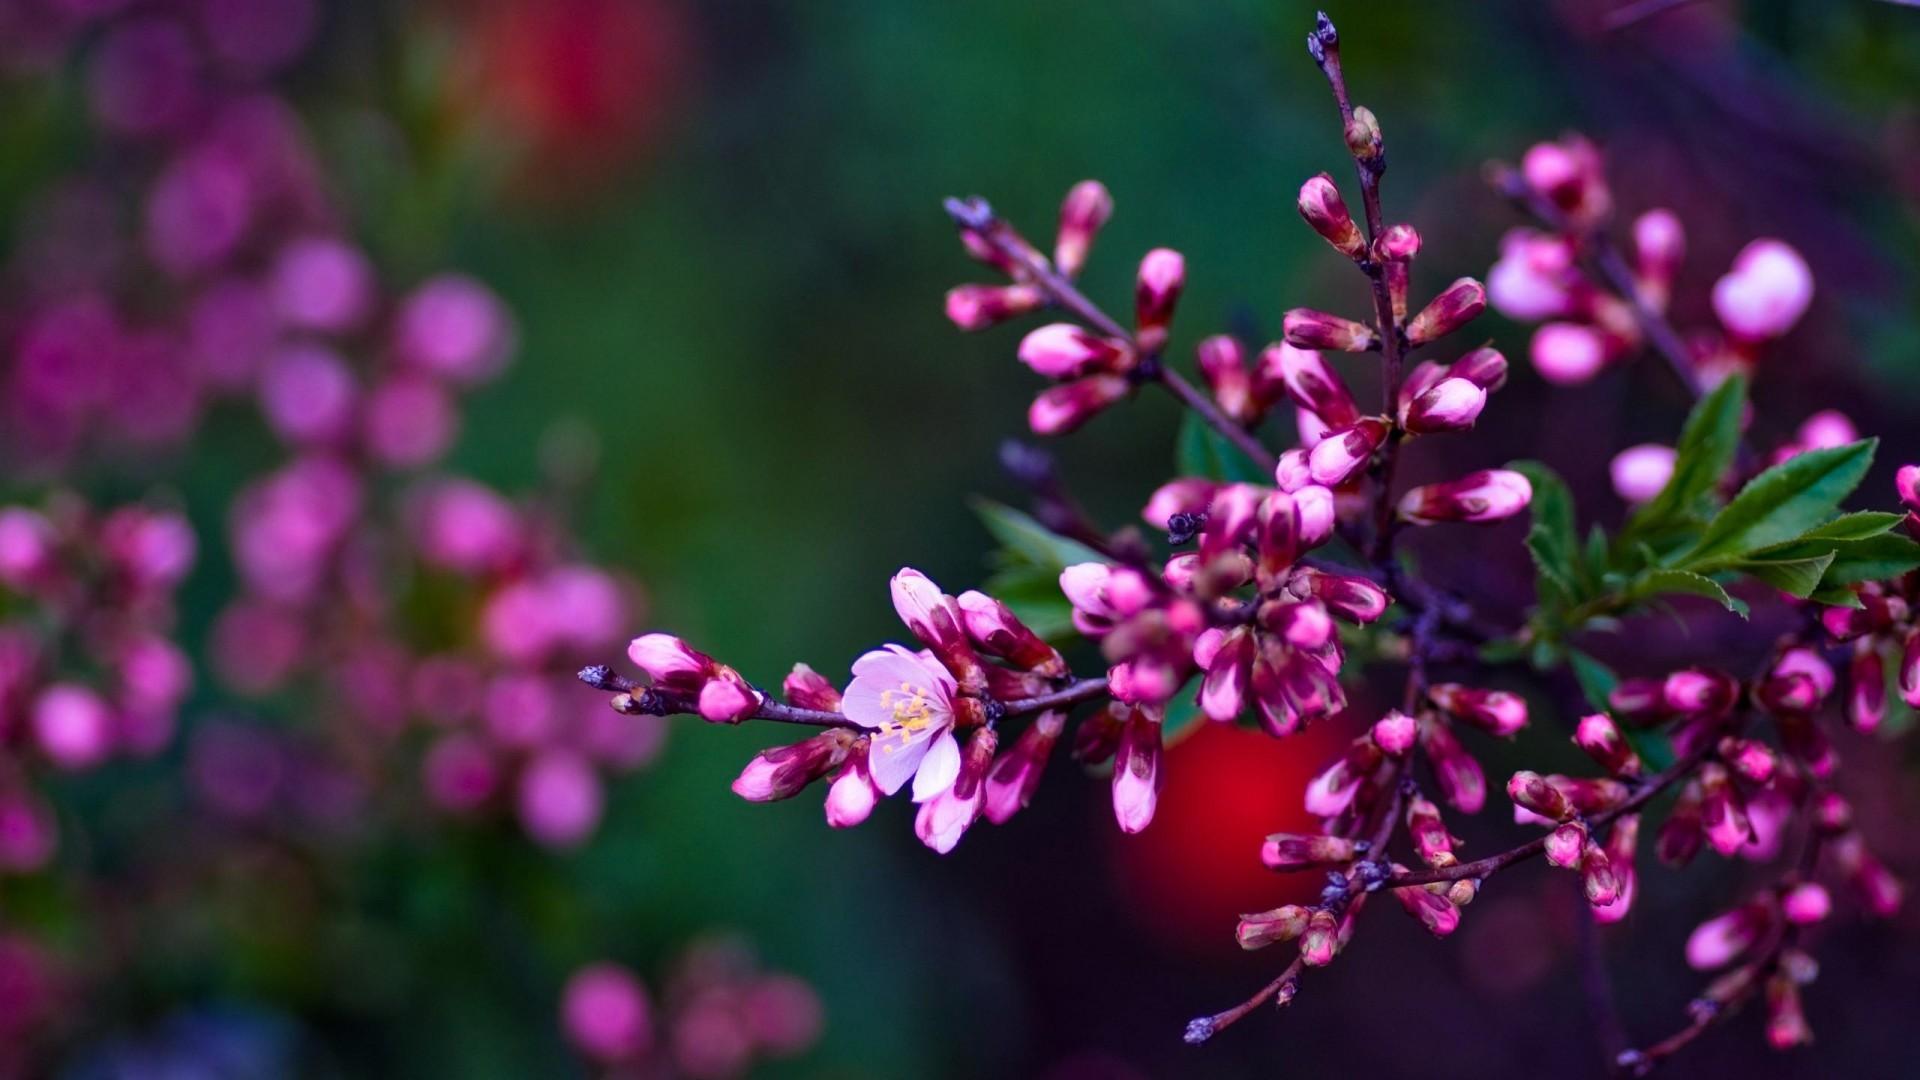 Spring Flowers HD Wallpapers